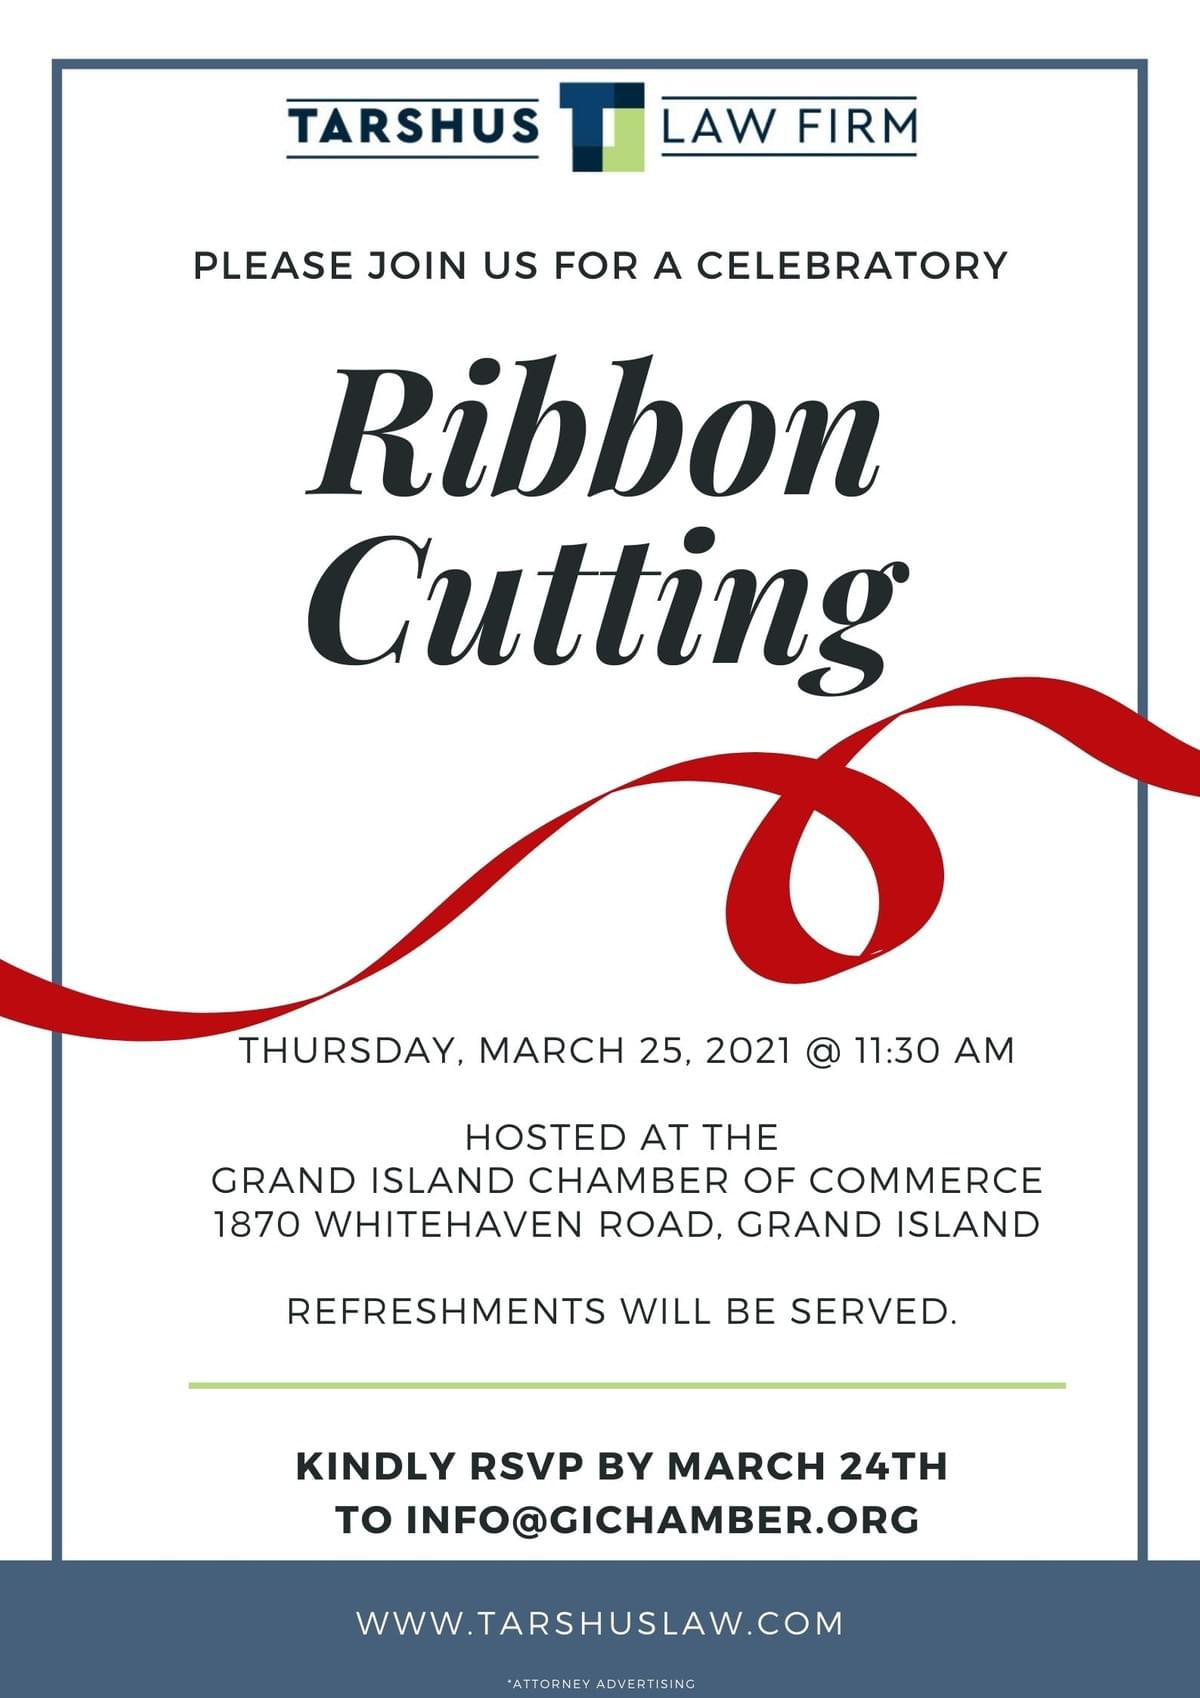 Tarshus Law Firm Celebratory Ribbon Cutting 2021